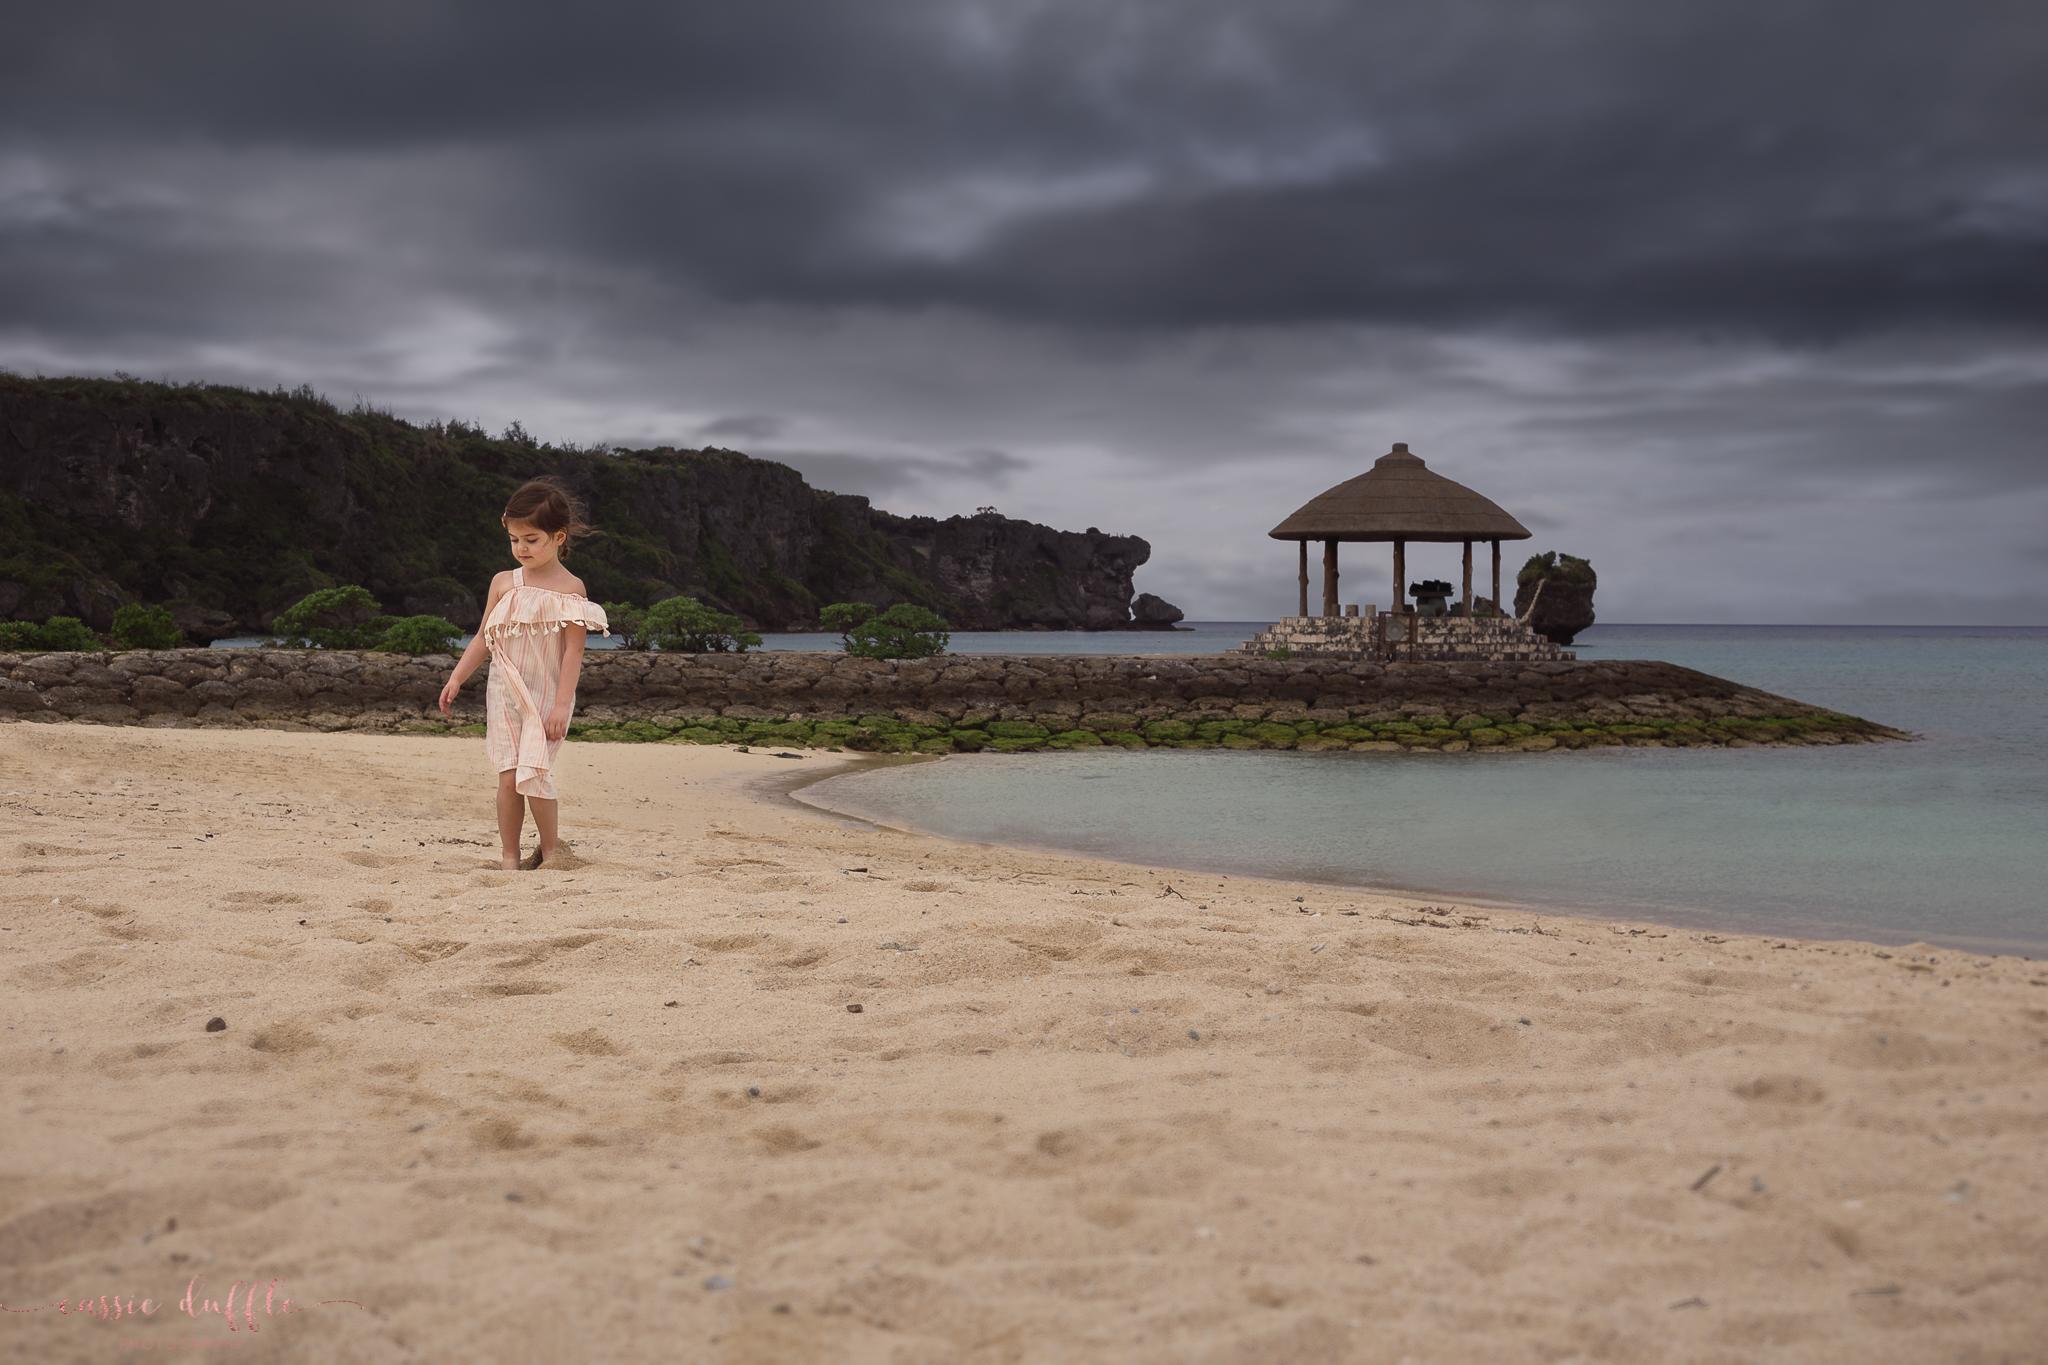 Nabi Beach in Okinawa, Japan